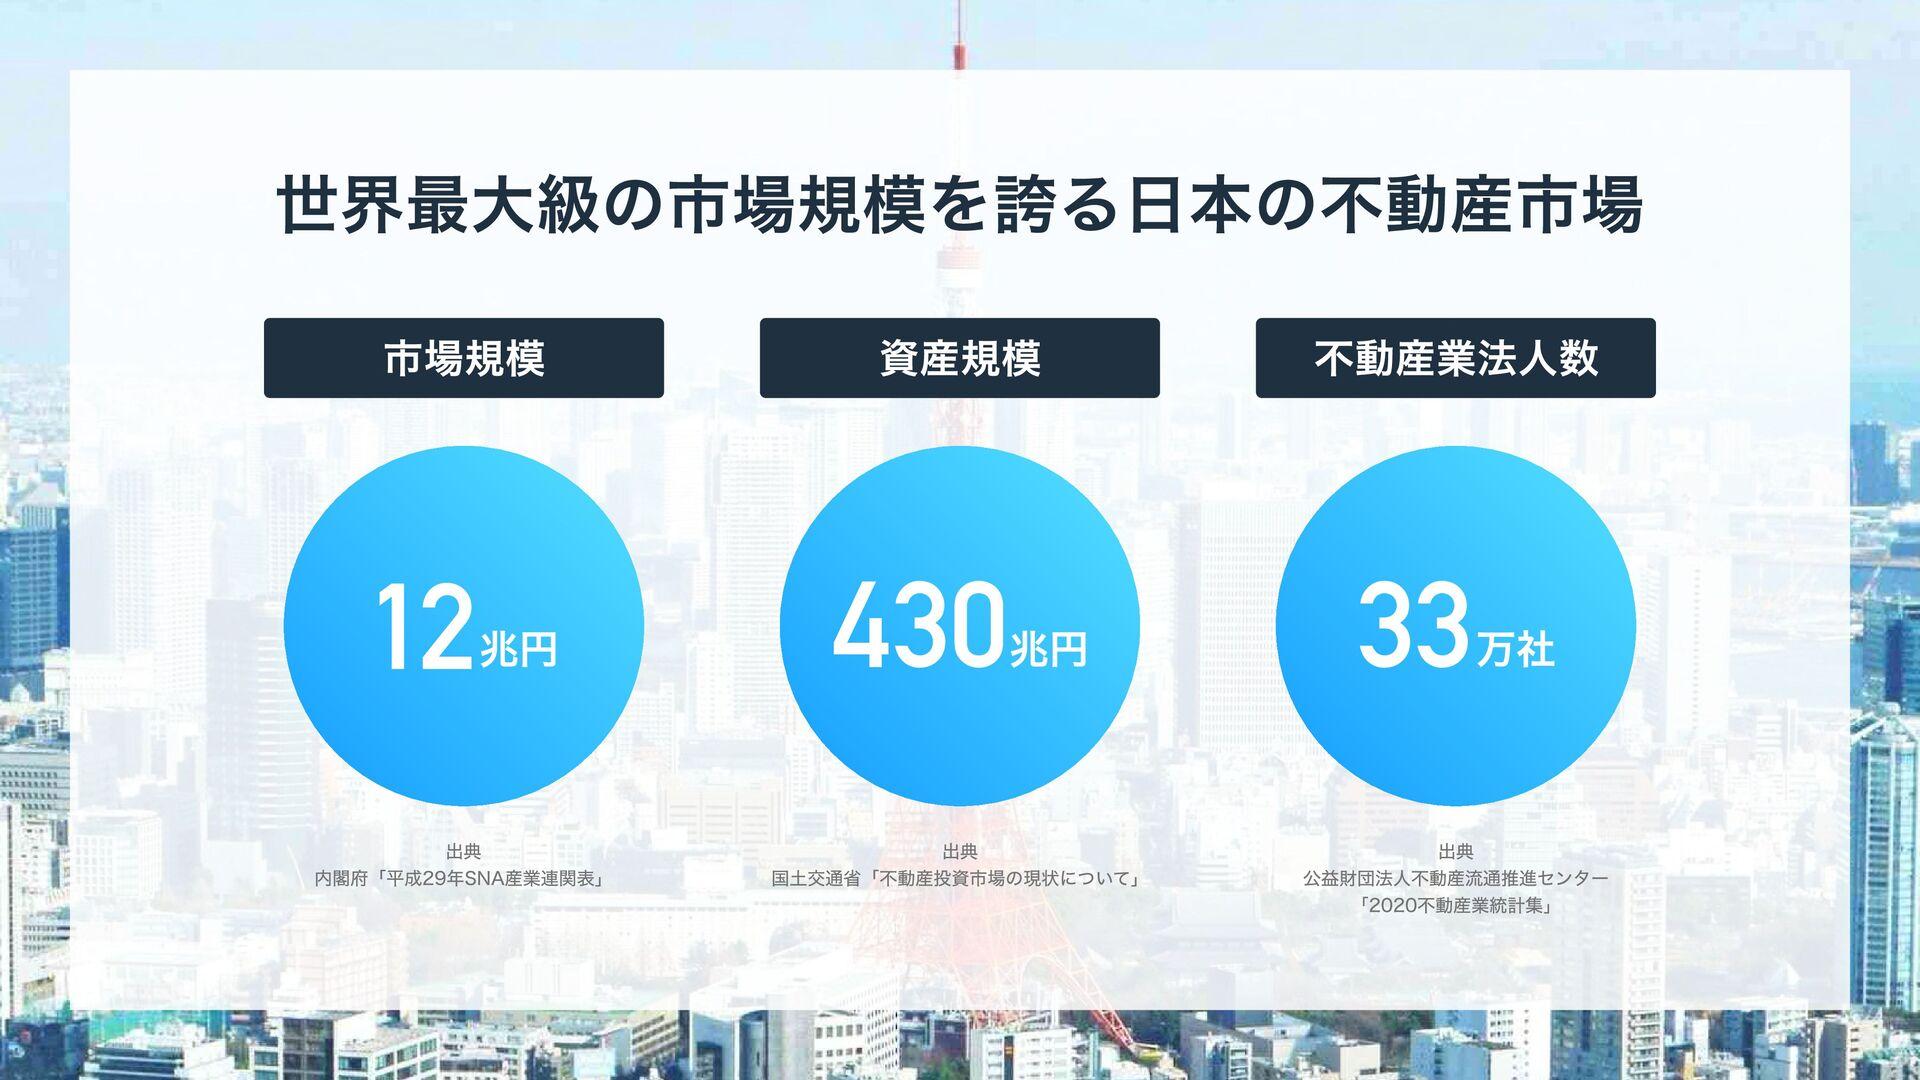 世界最大級の市場規模を誇る日本の不動産市場 12兆円 市場規模 出典  内閣府「平成29年S...